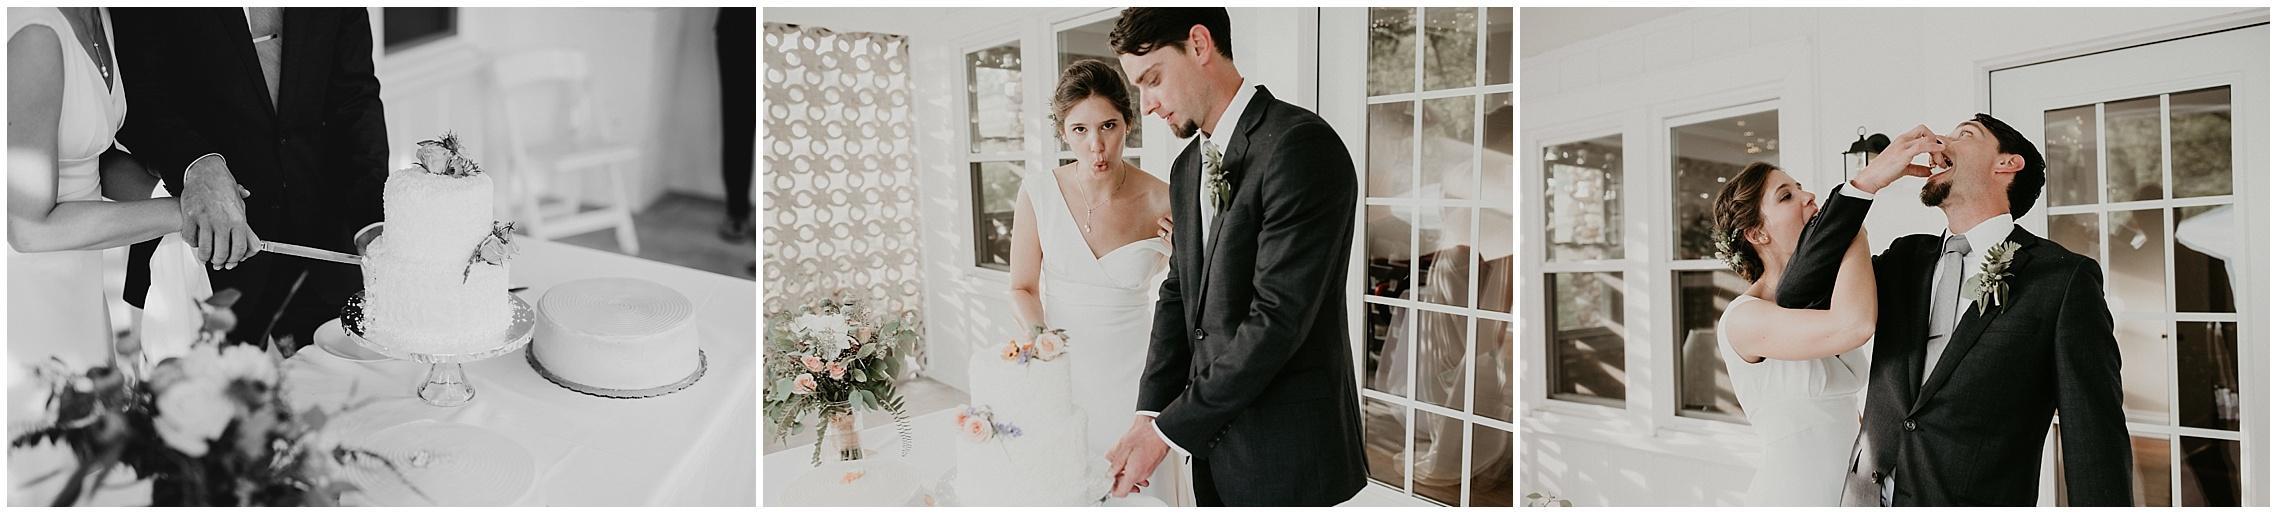 rock_creek_gardens_washington_wedding_photographer_0343.jpg